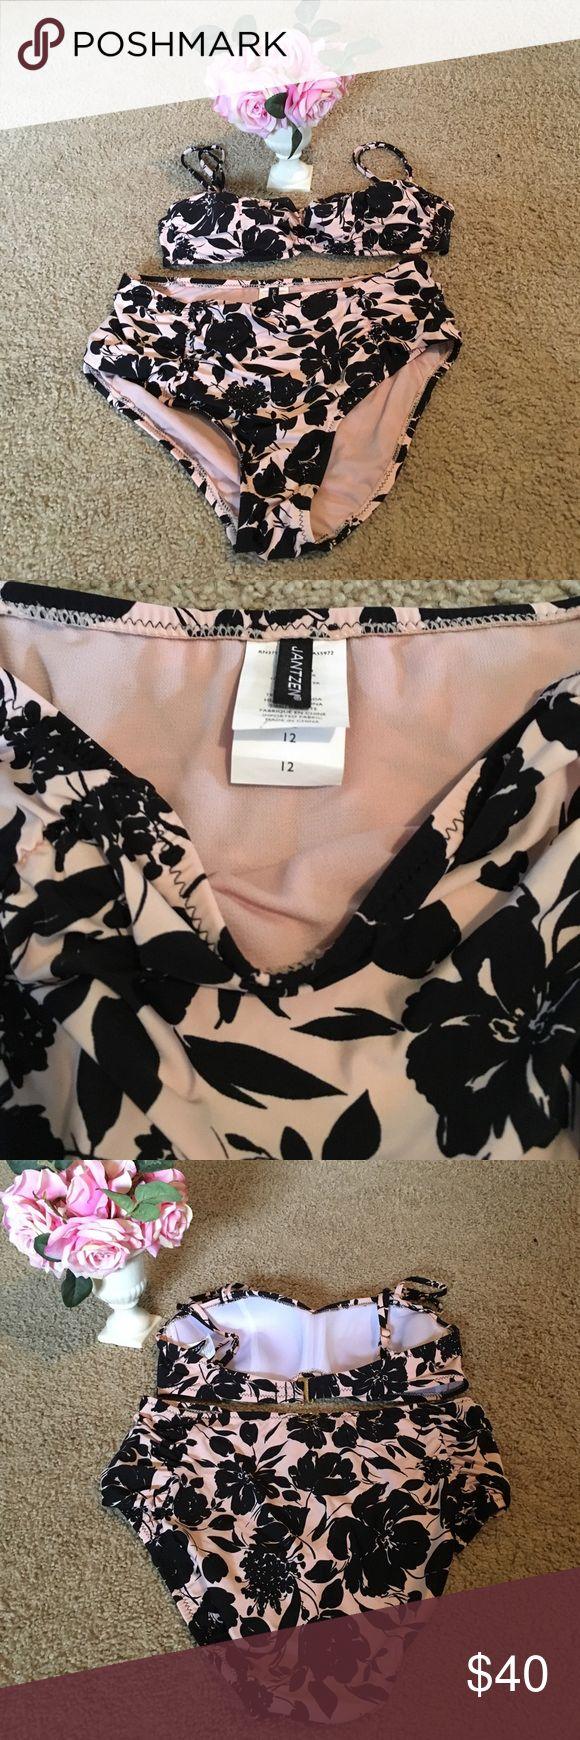 Jantzen 2 Piece High Waisted  Bathing Suit Pretty Taupe & Black Flowered Pattern - High Waisted Bathing Suit NWOT- Jantzen Swim Bikinis